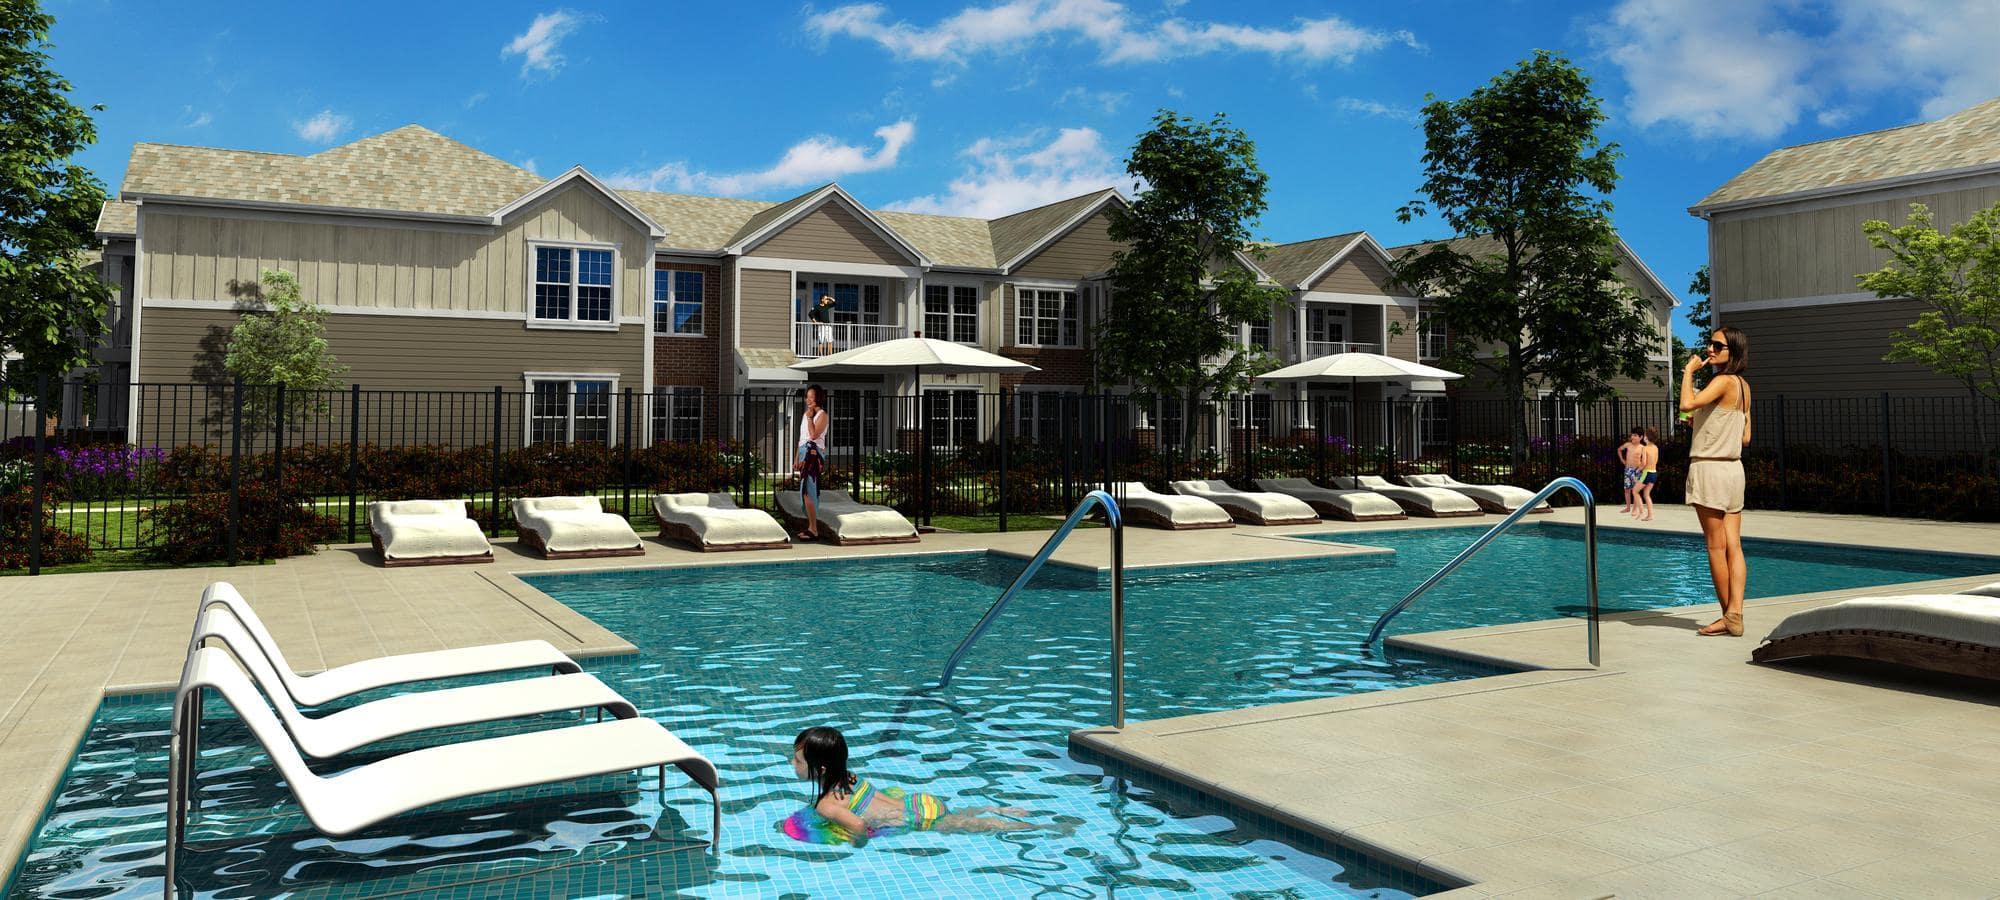 Apartments in McDonough, GA